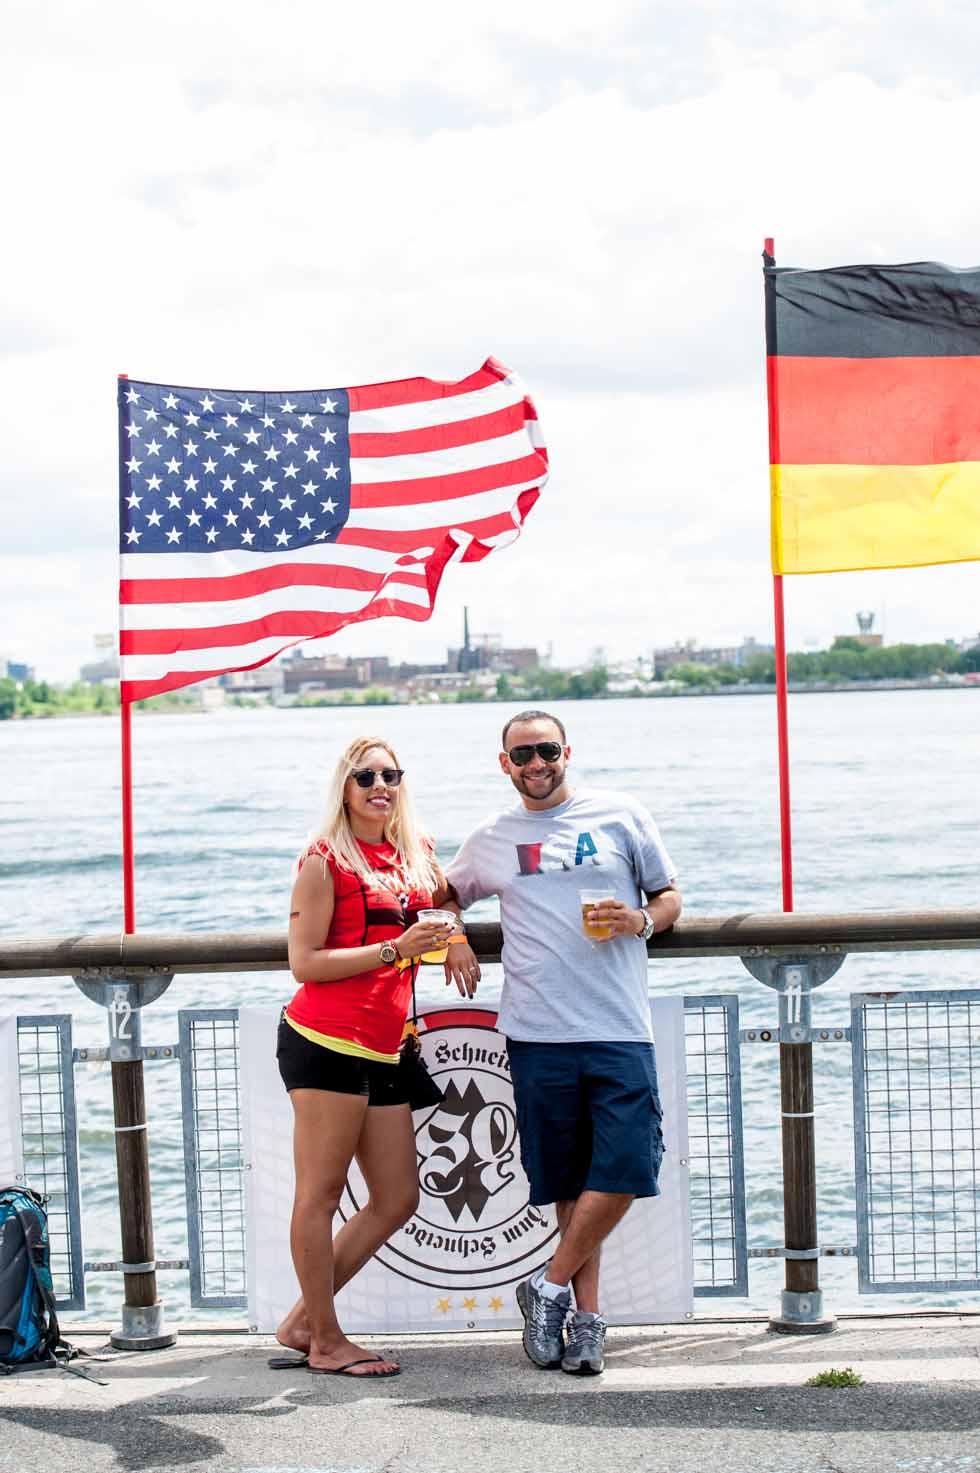 zum-schneider-nyc-2014-world-cup-germany-usa-8422.jpg